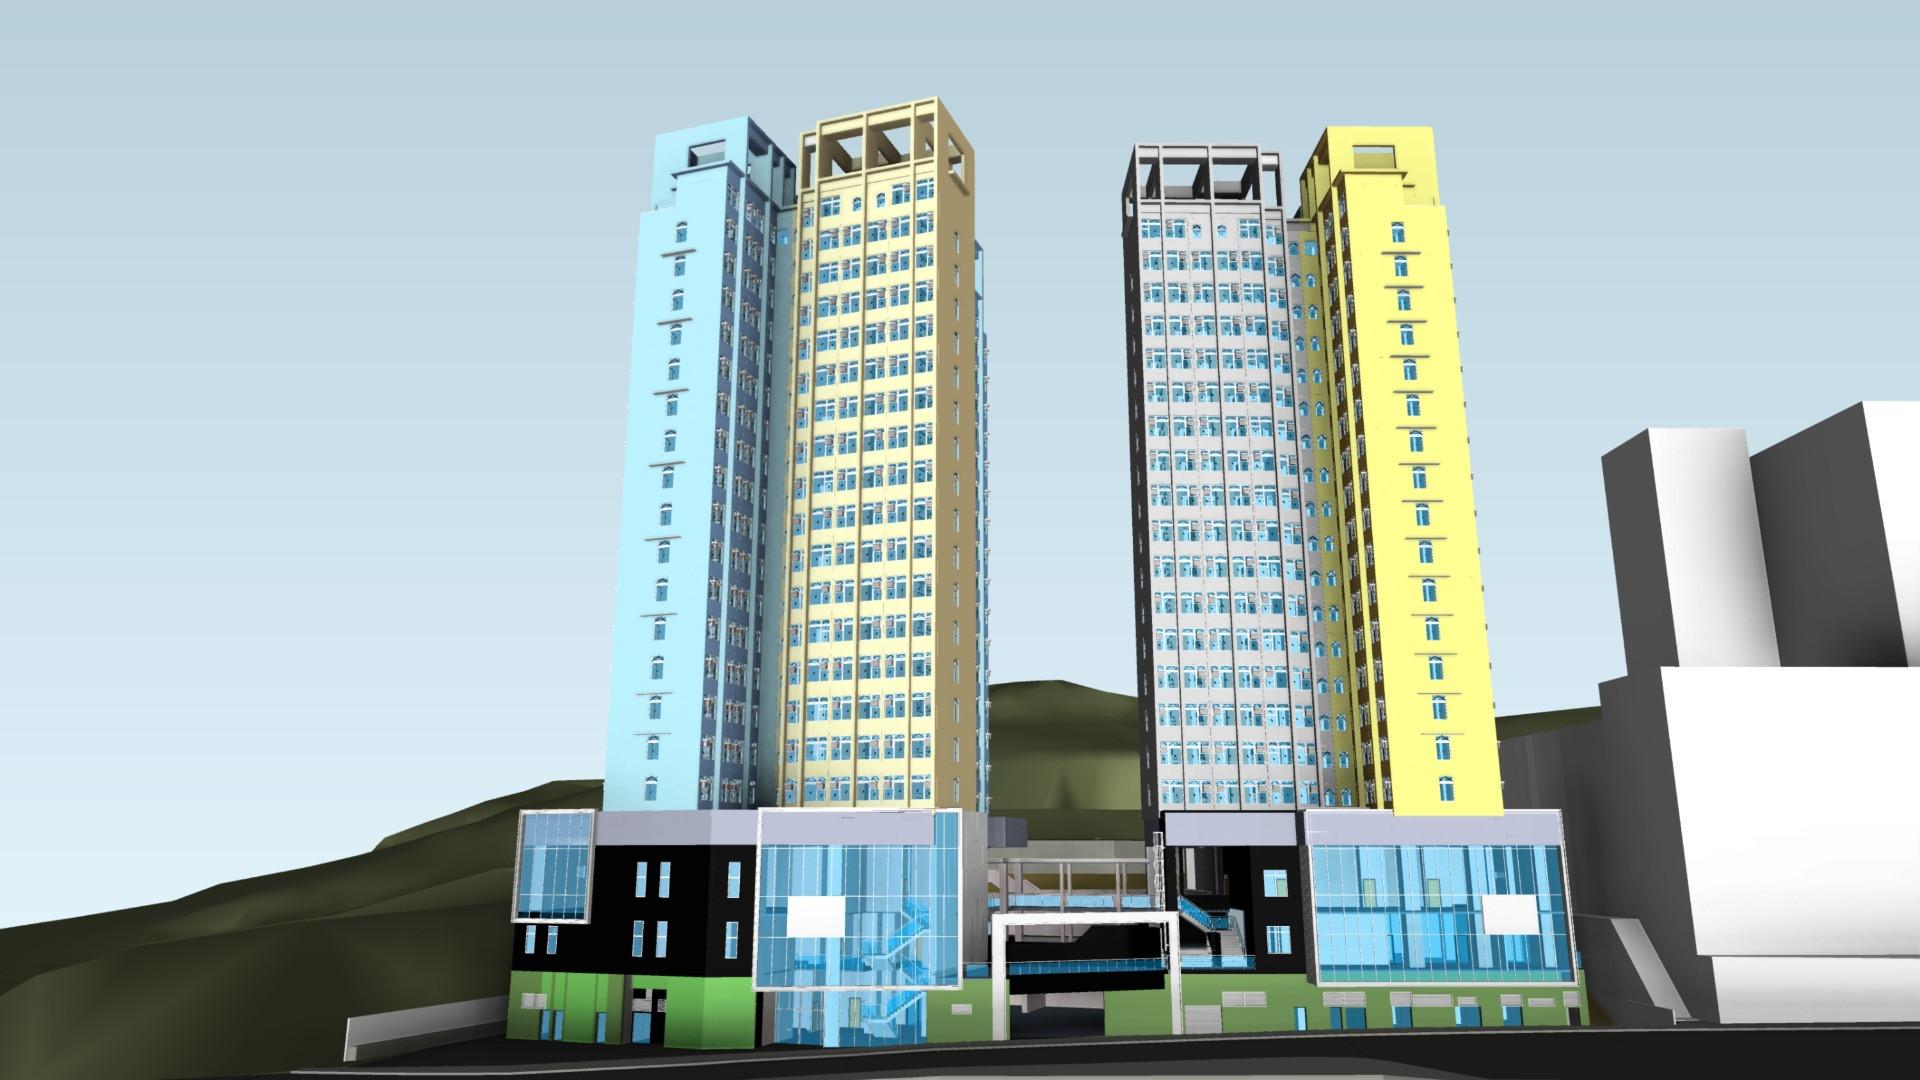 HKU Residence